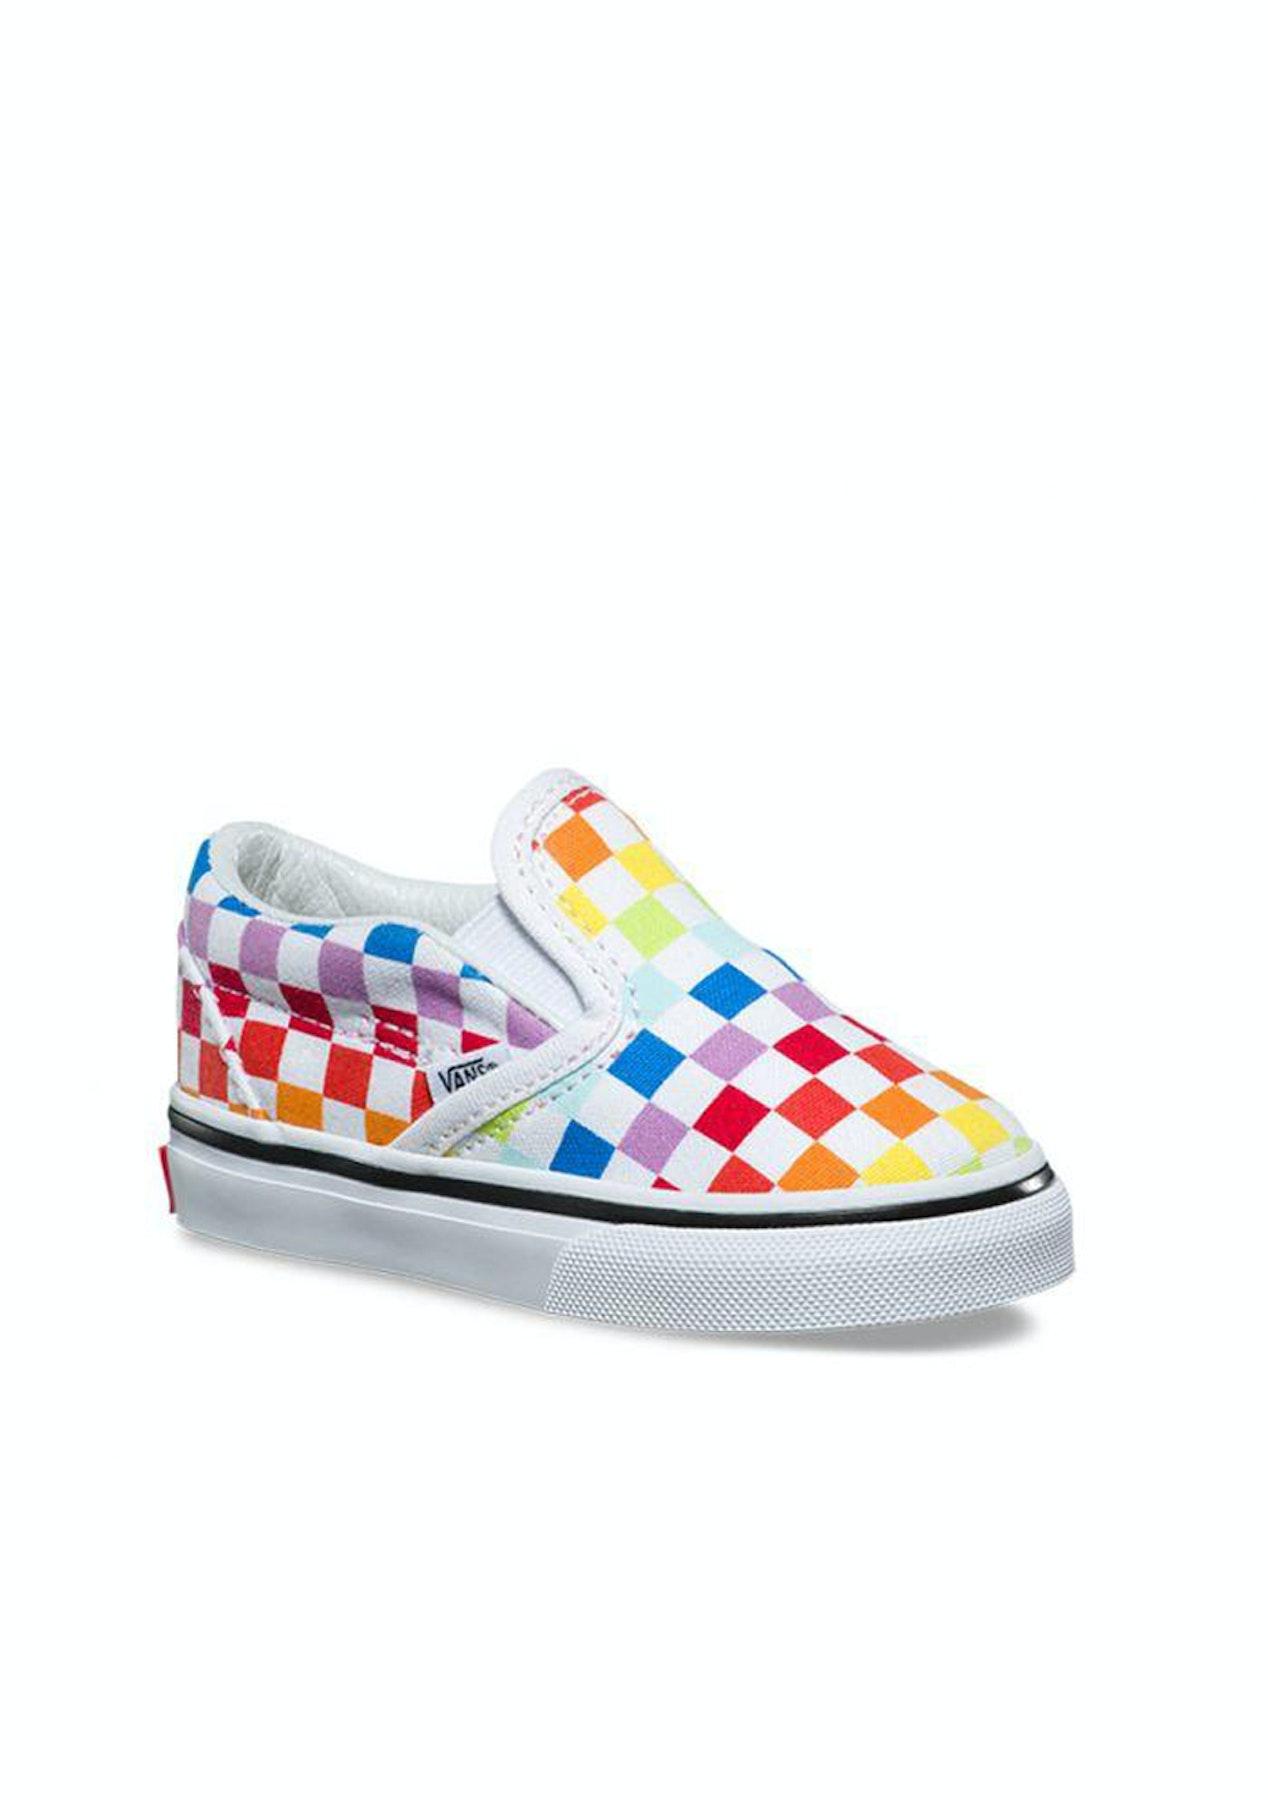 5e0be4cc9 Vans - Toddler Cso (Checkb) - Rainbow/Wht - Vans - Onceit